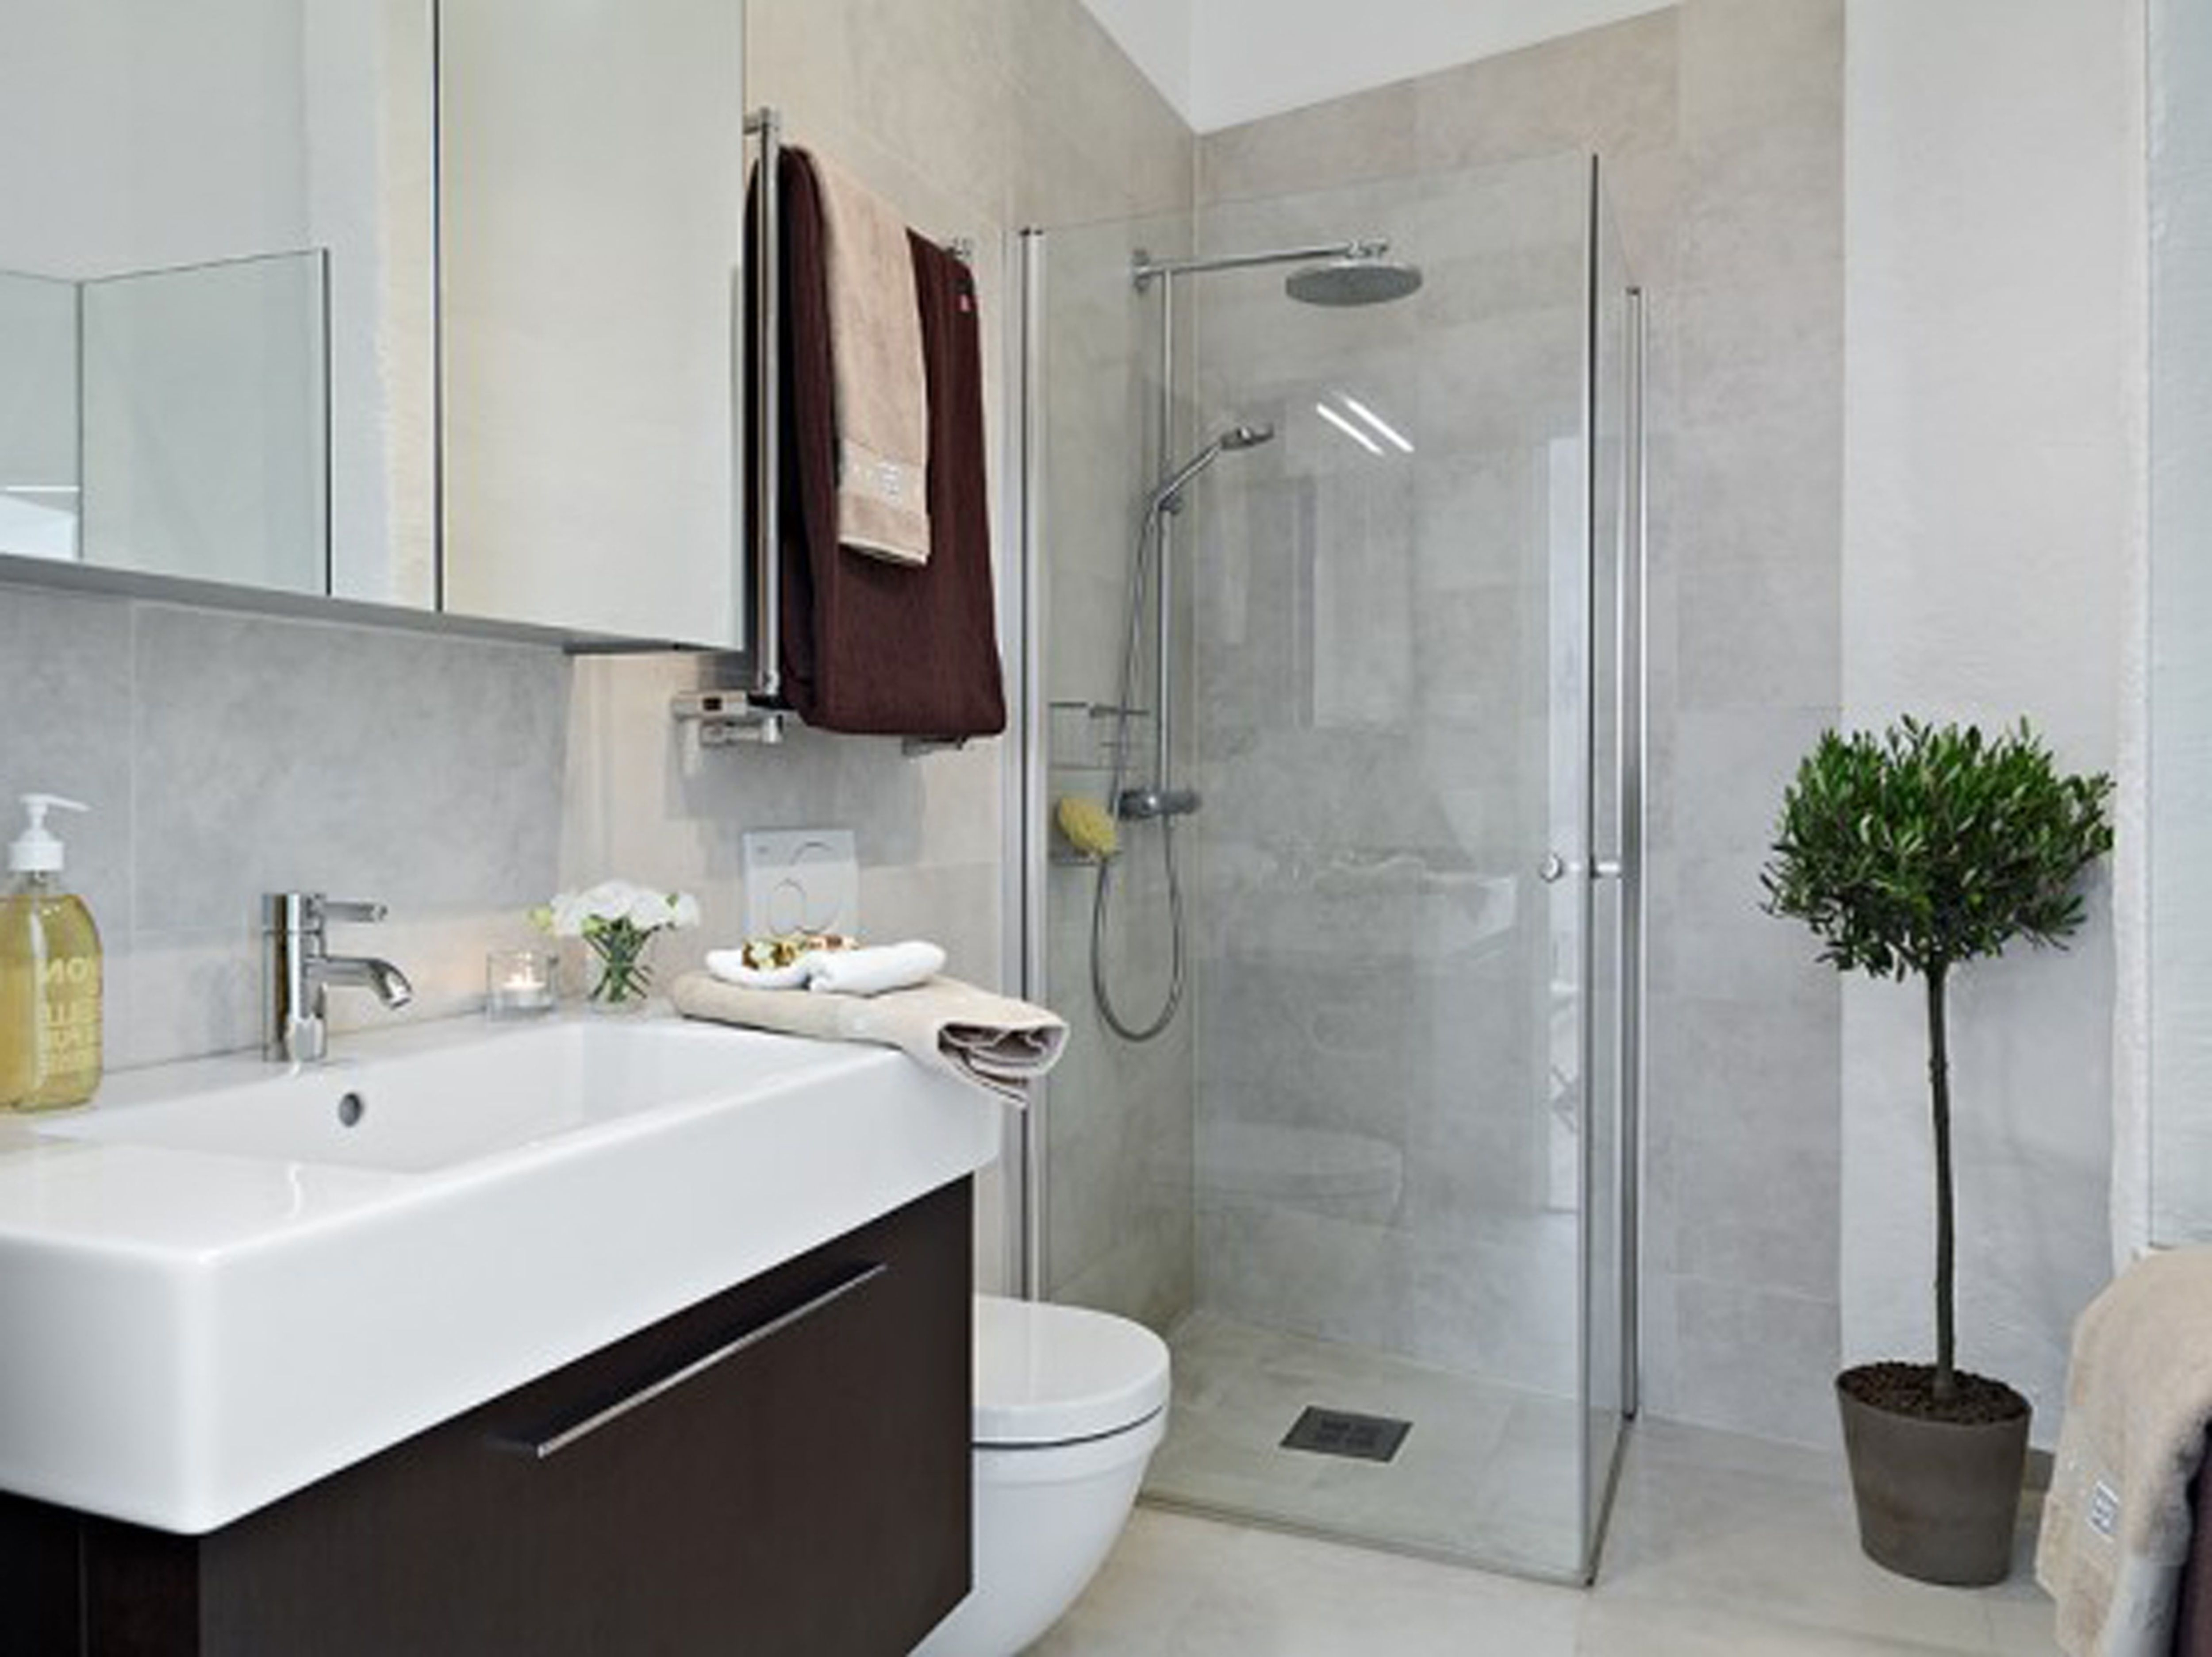 Small Bathroom Design Layout — Randolph Indoor and Outdoor ...